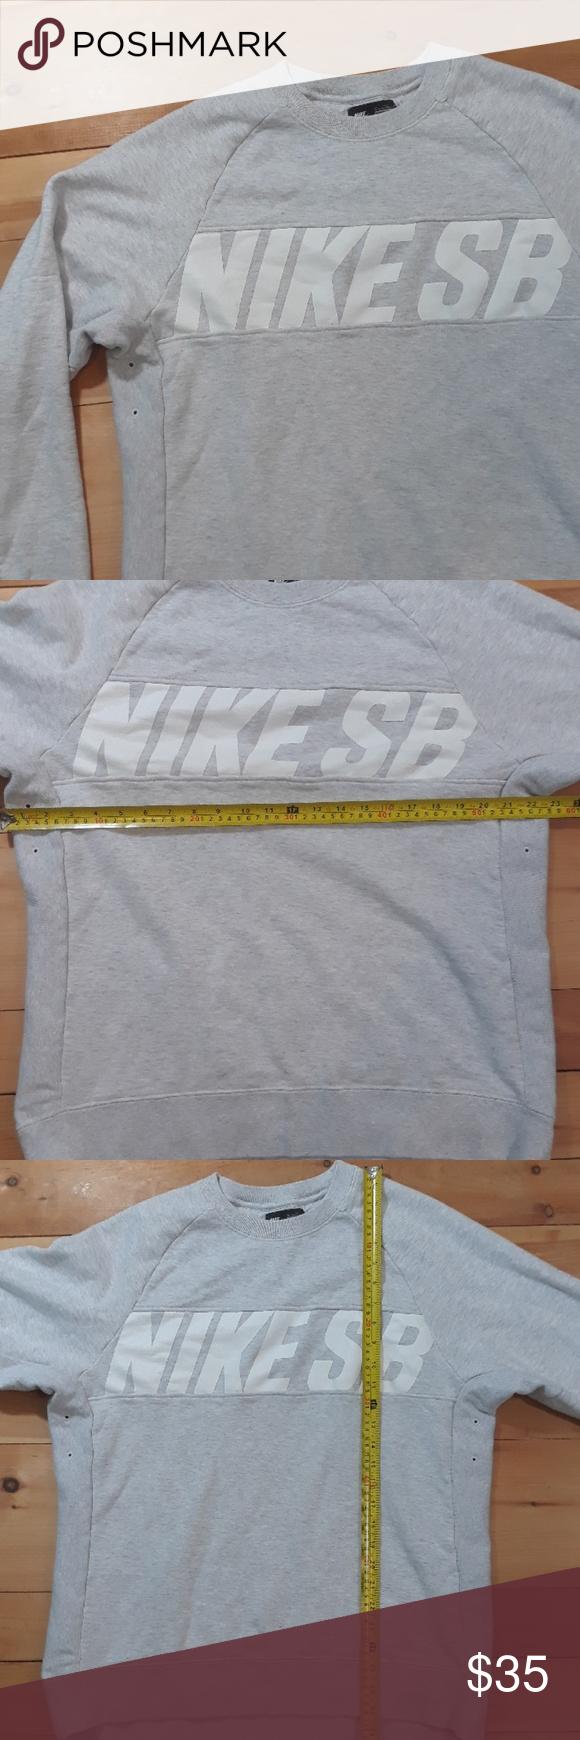 Nike Sb Everett Motion Crew Sweatshirt 704847 051 Crew Sweatshirts Nike Nike Sb [ 1740 x 580 Pixel ]